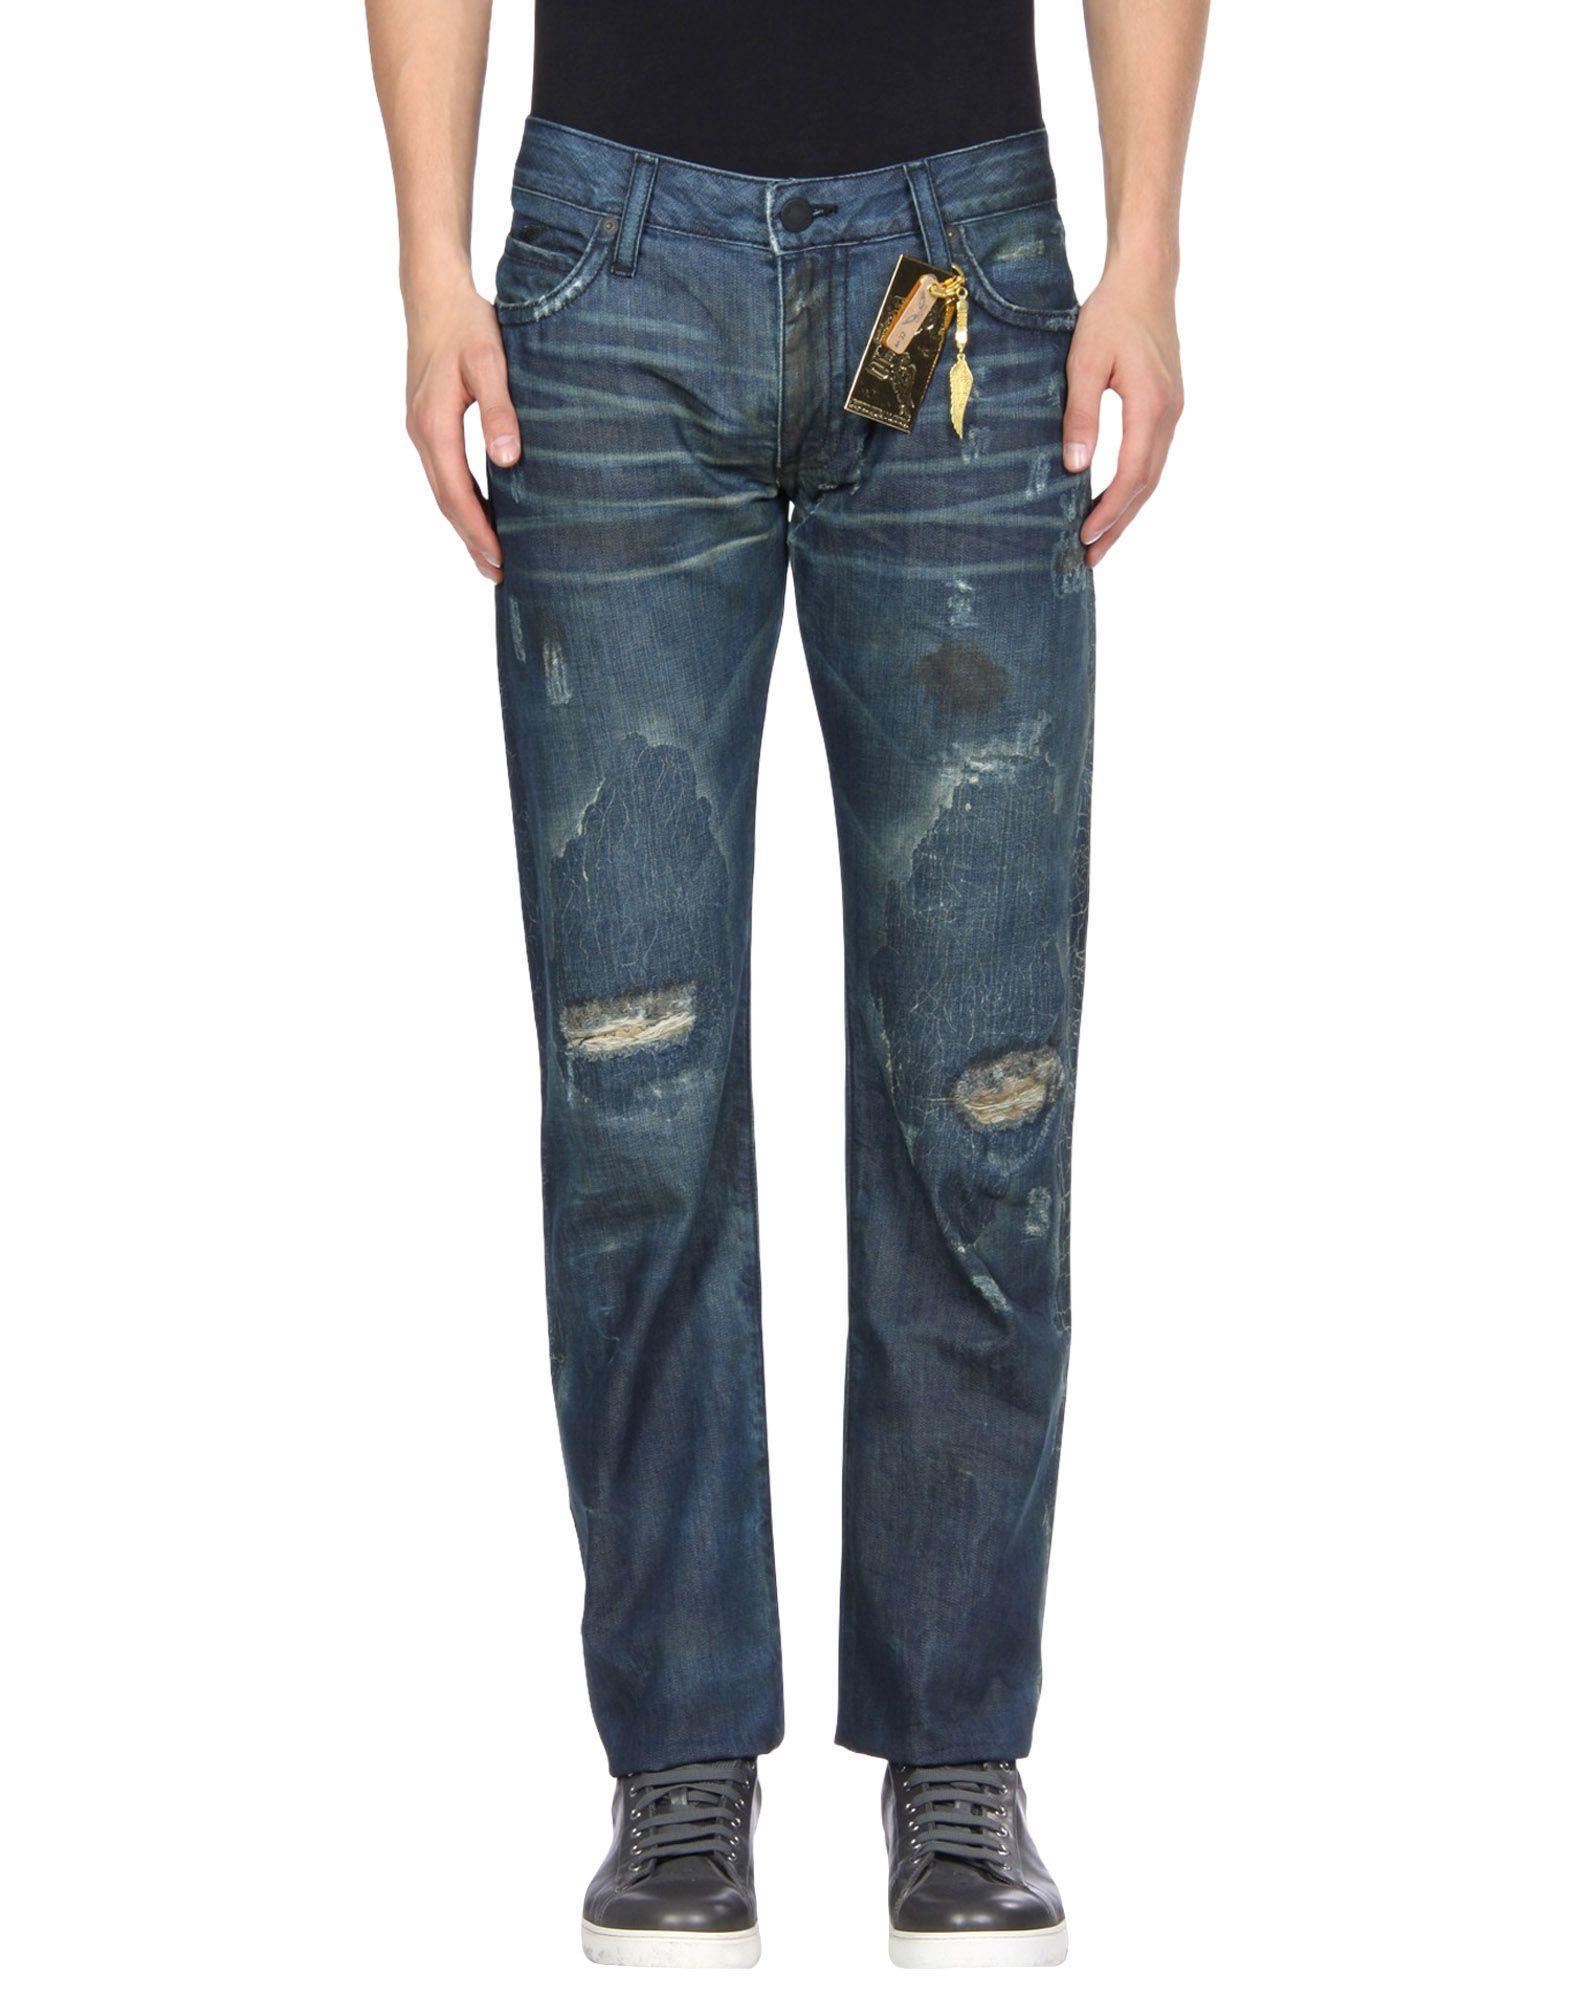 Robin's Jean Denim Pants In Blue